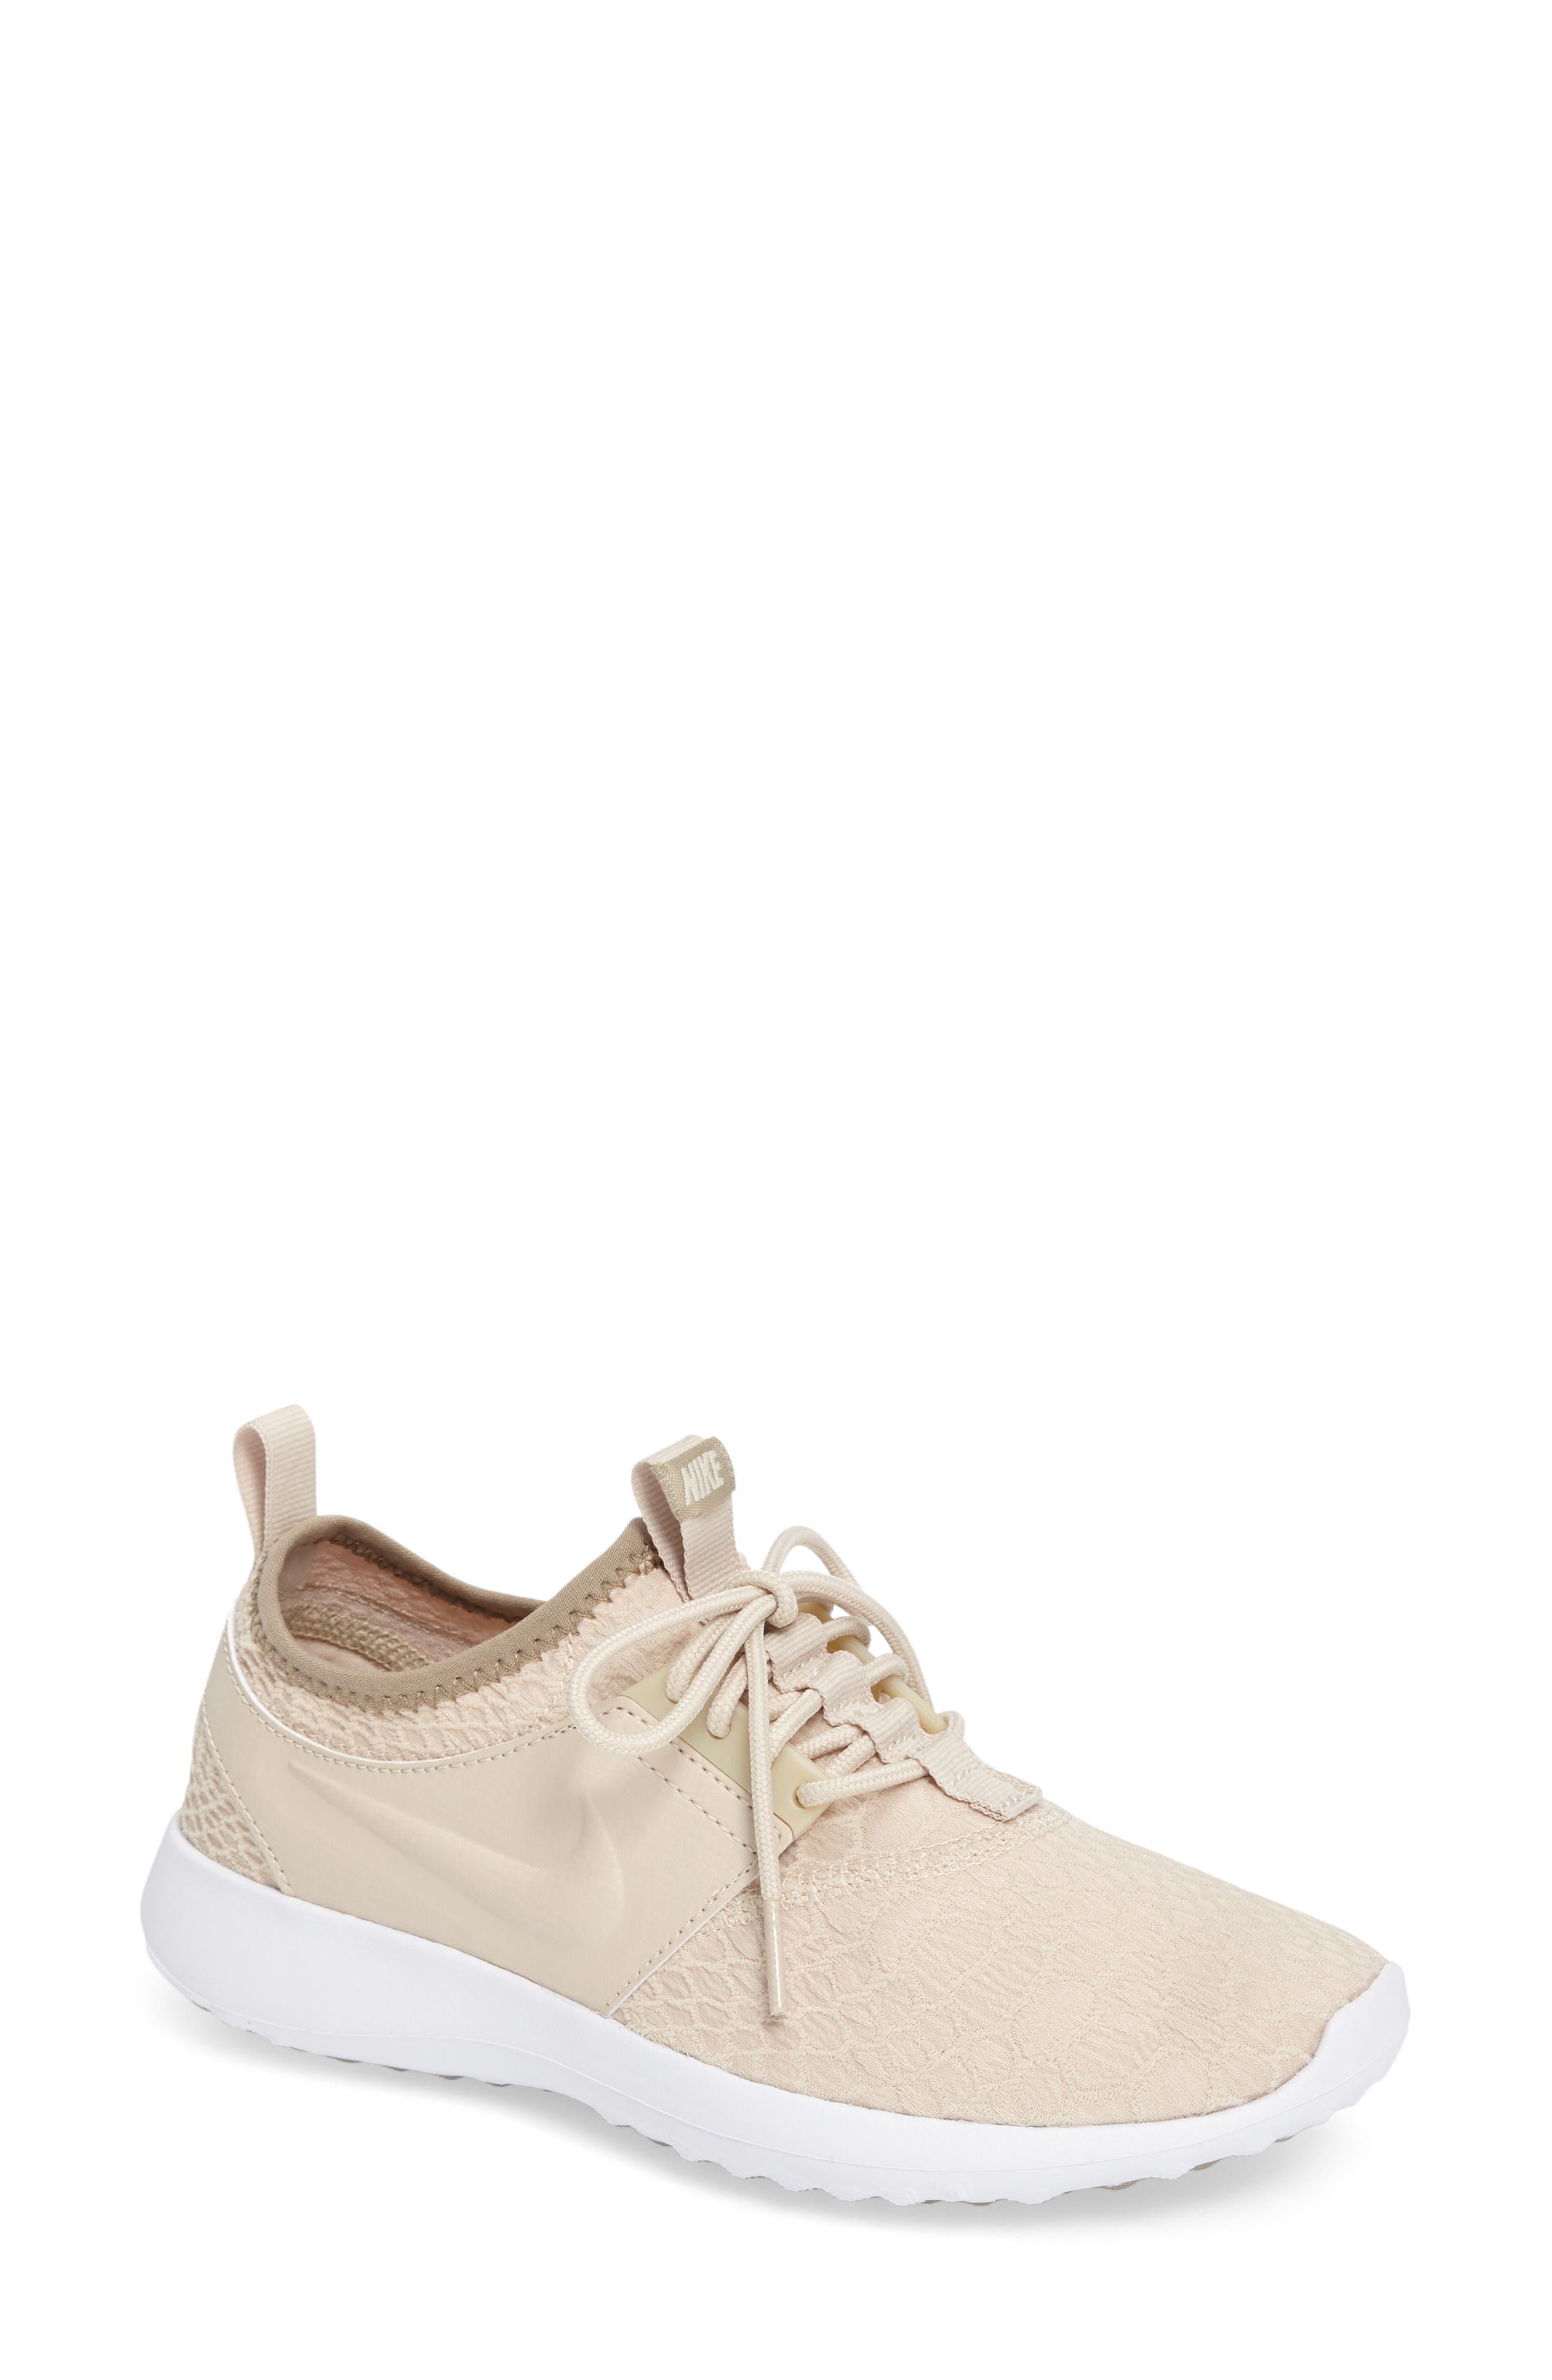 Juvenate SE Sneaker,                             Main thumbnail 11, color,